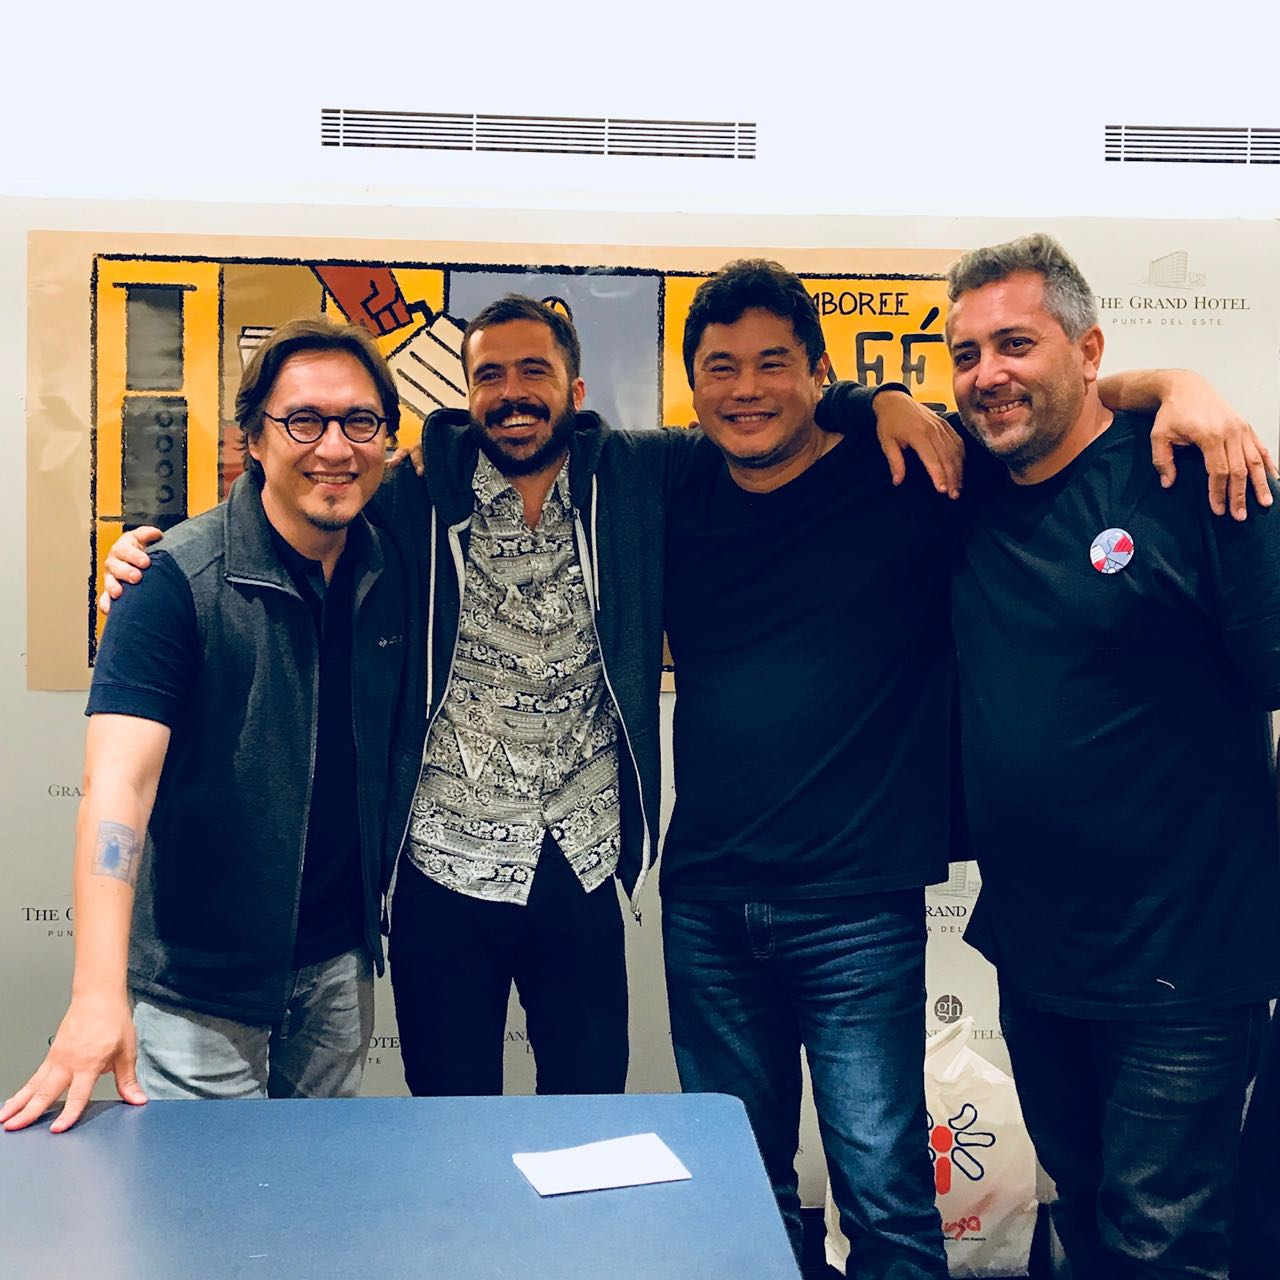 Daniel Kondo, Nacho Gallo y Juan Pablo Imbellone